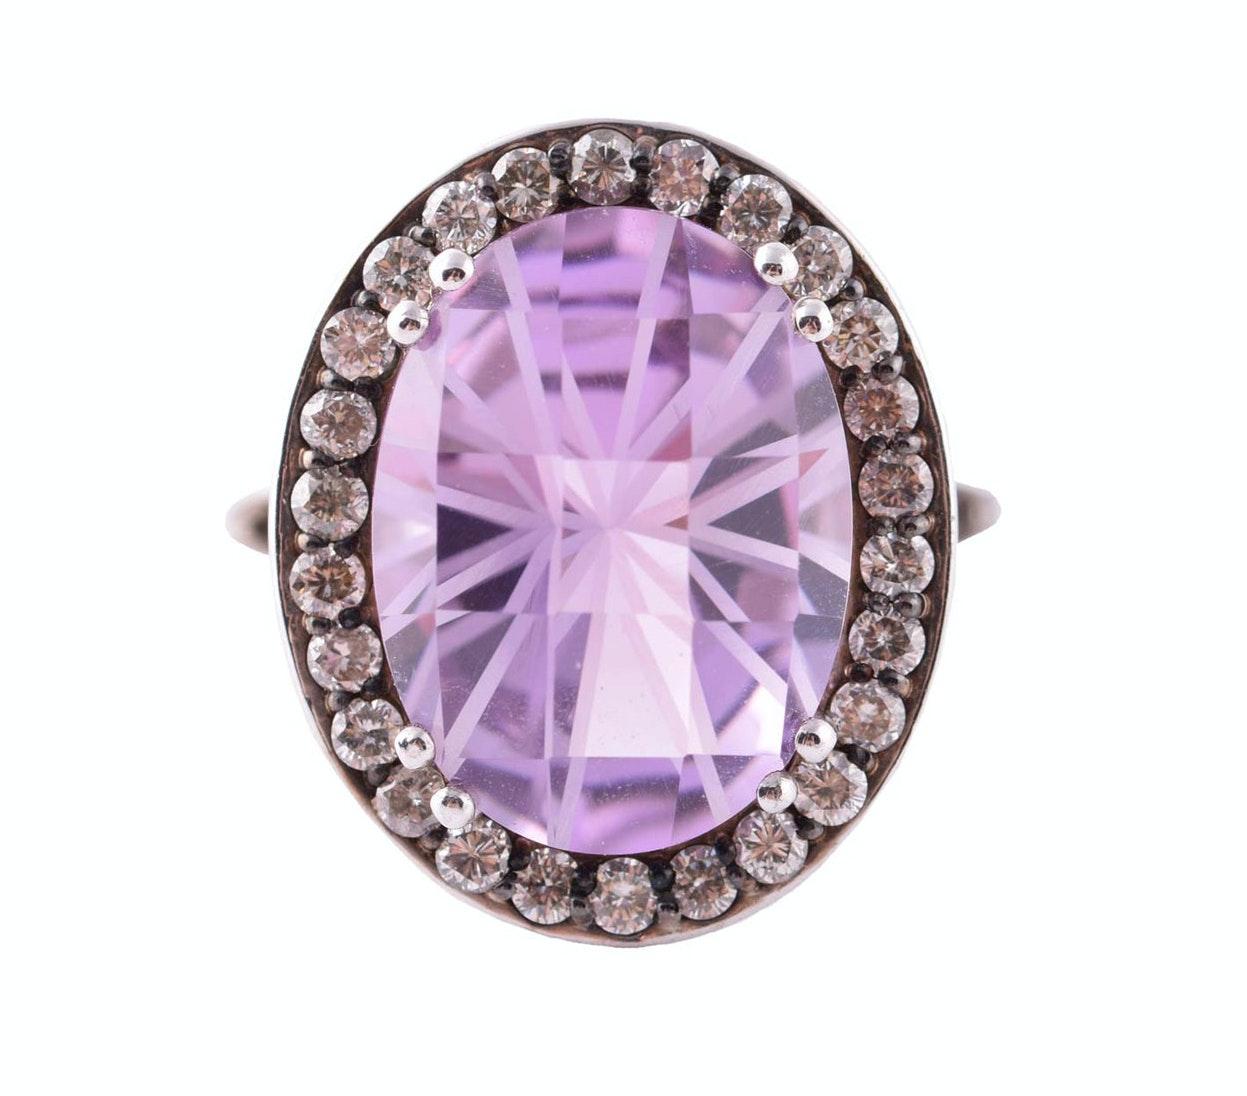 Fine Jewelry, Home Furnishings, Fine Crystal & More